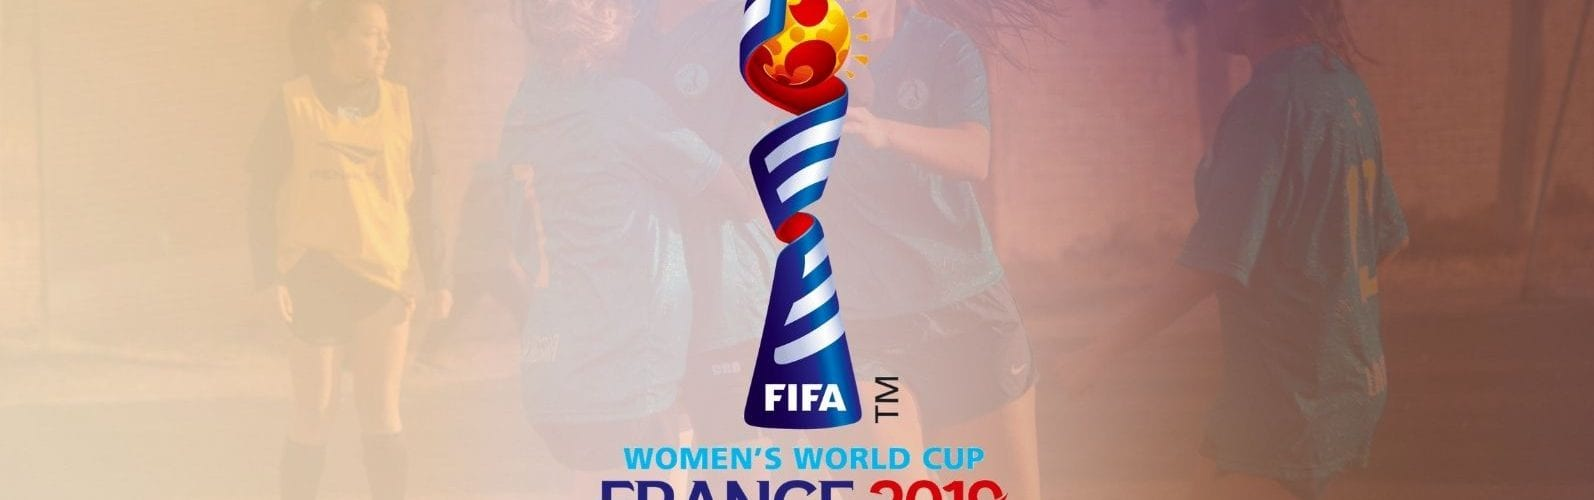 FIFA Women's World Cup Ticket Nightmares Continue